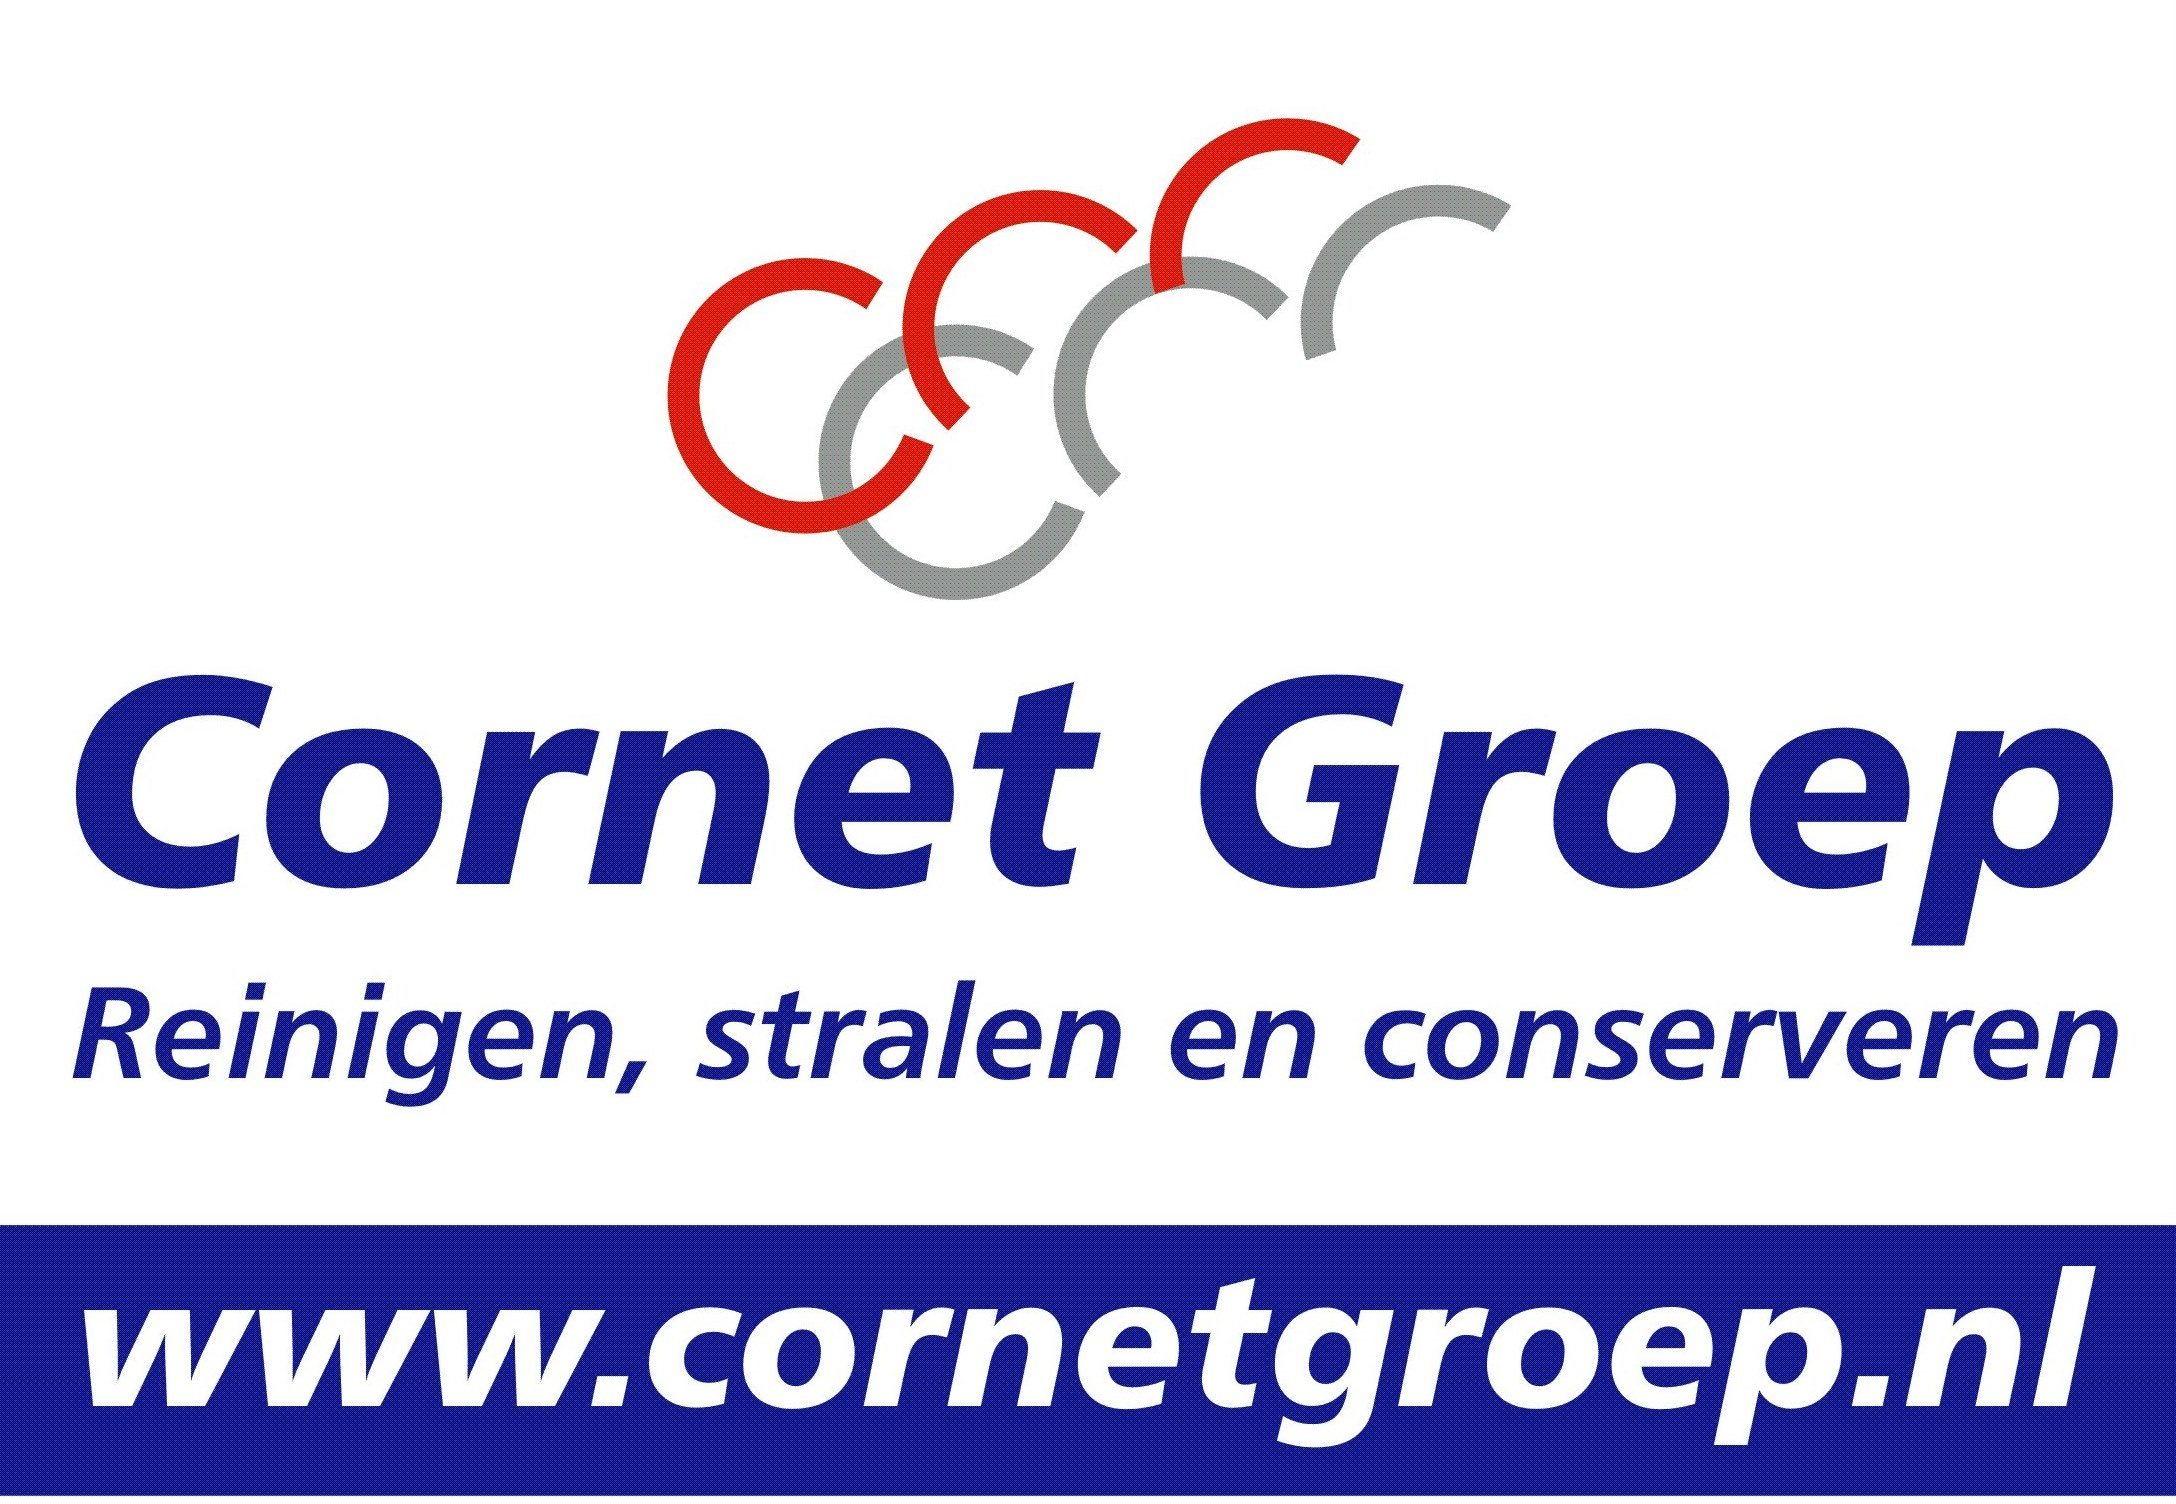 Cornet Groep